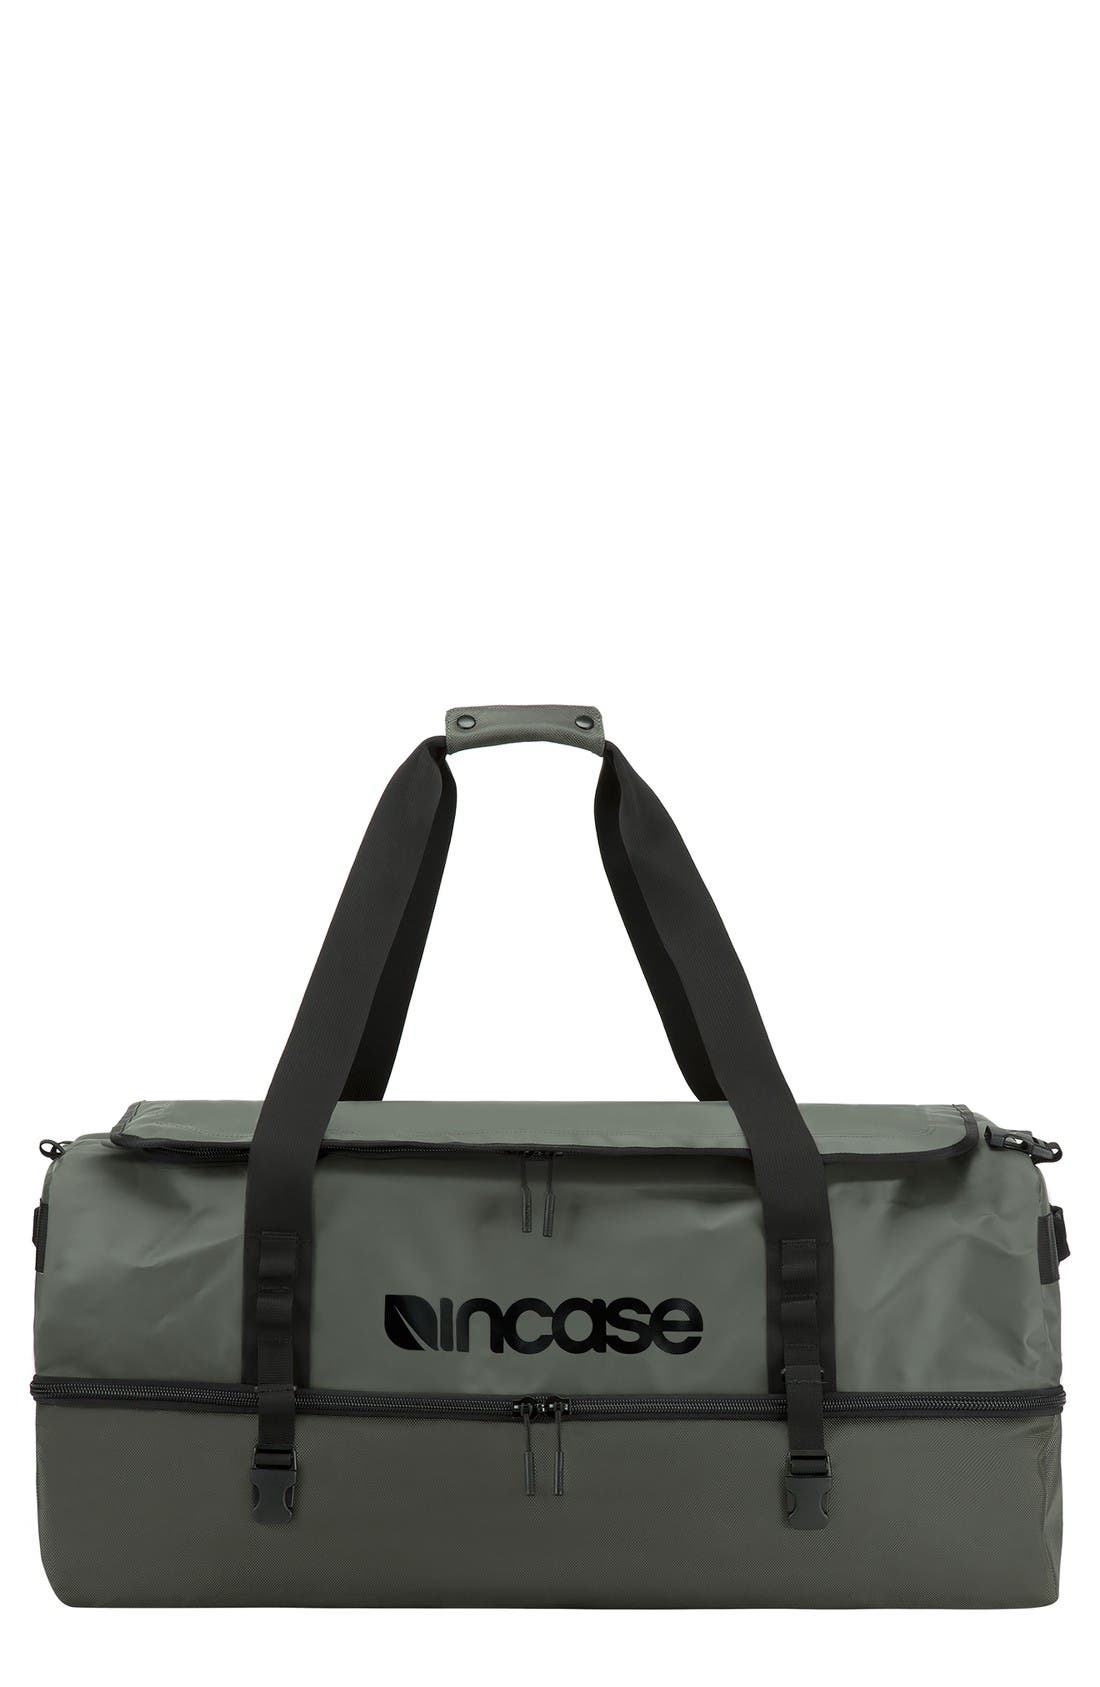 Incase Designs TRACTO Small Split Convertible Duffel Bag